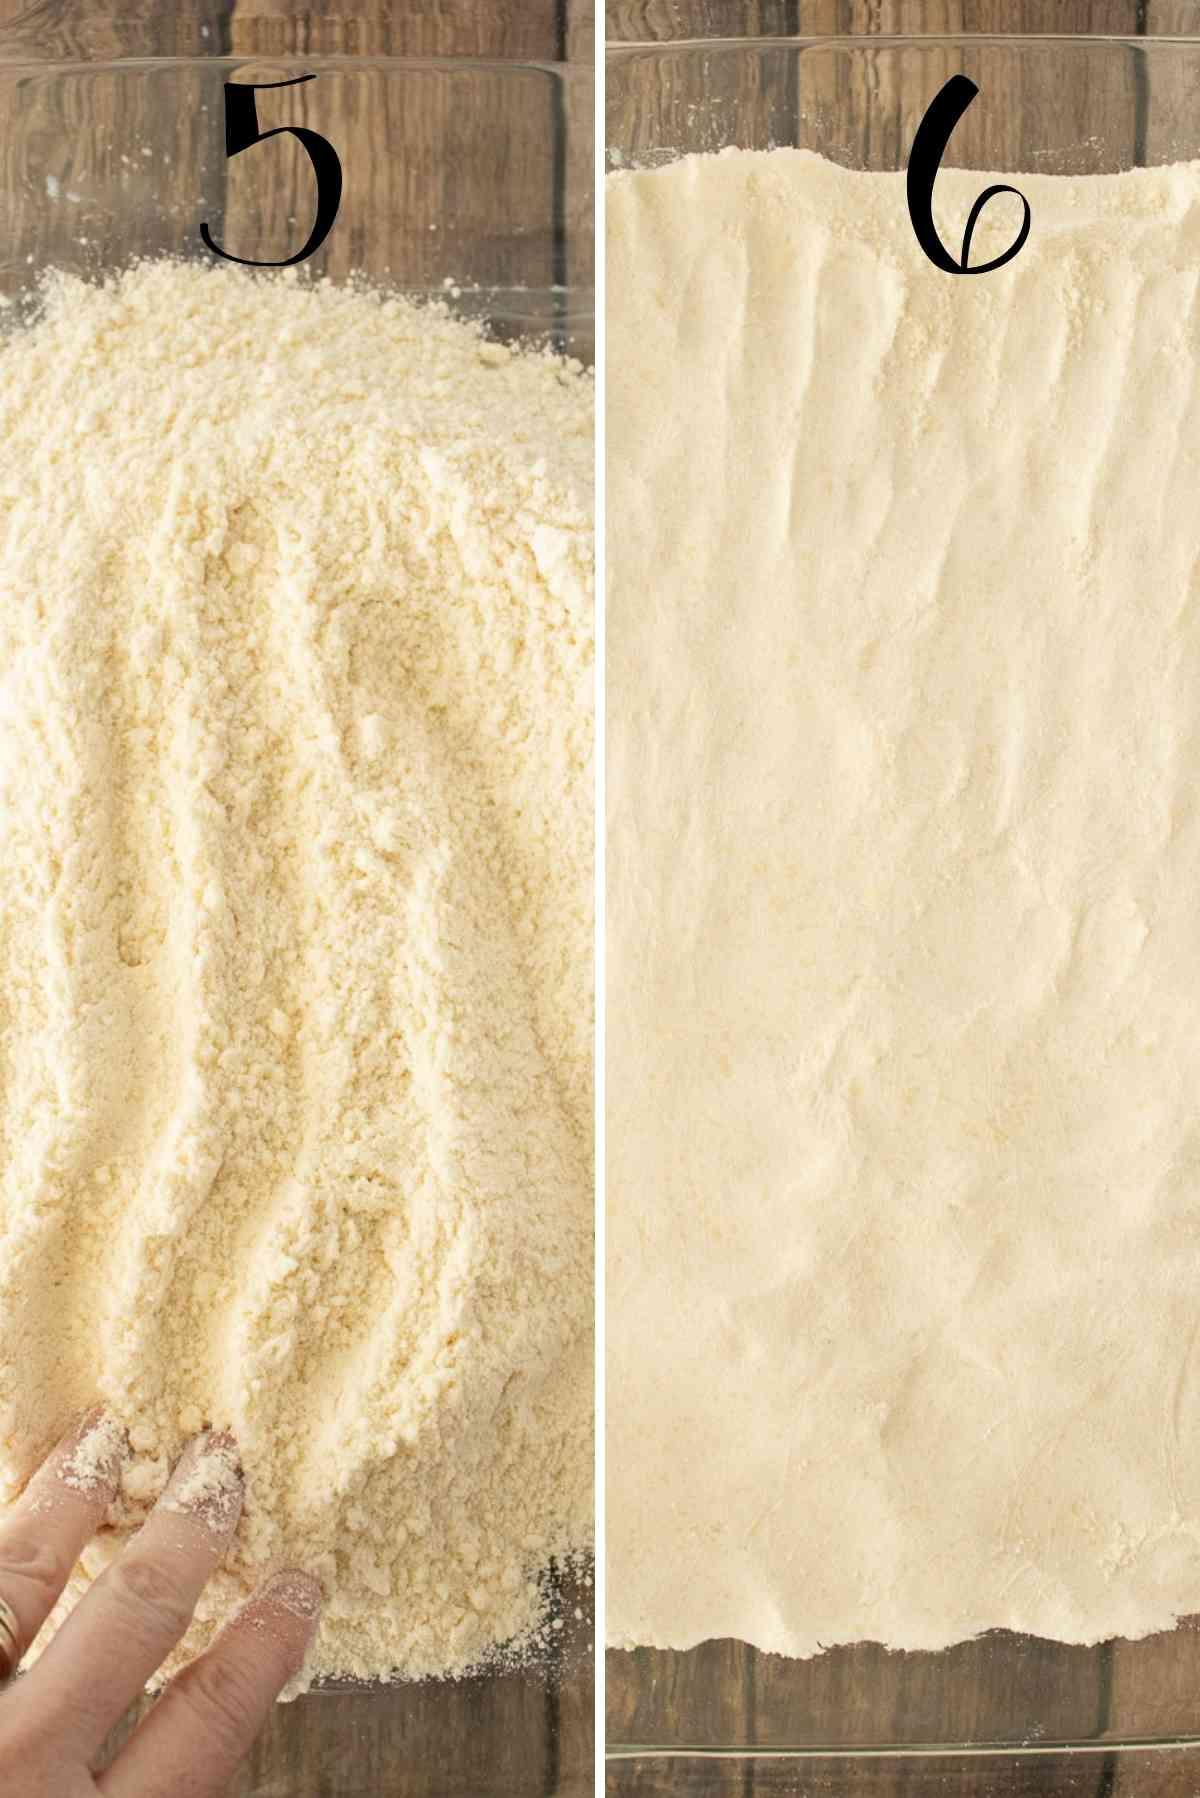 Press crust into prepared baking dish.